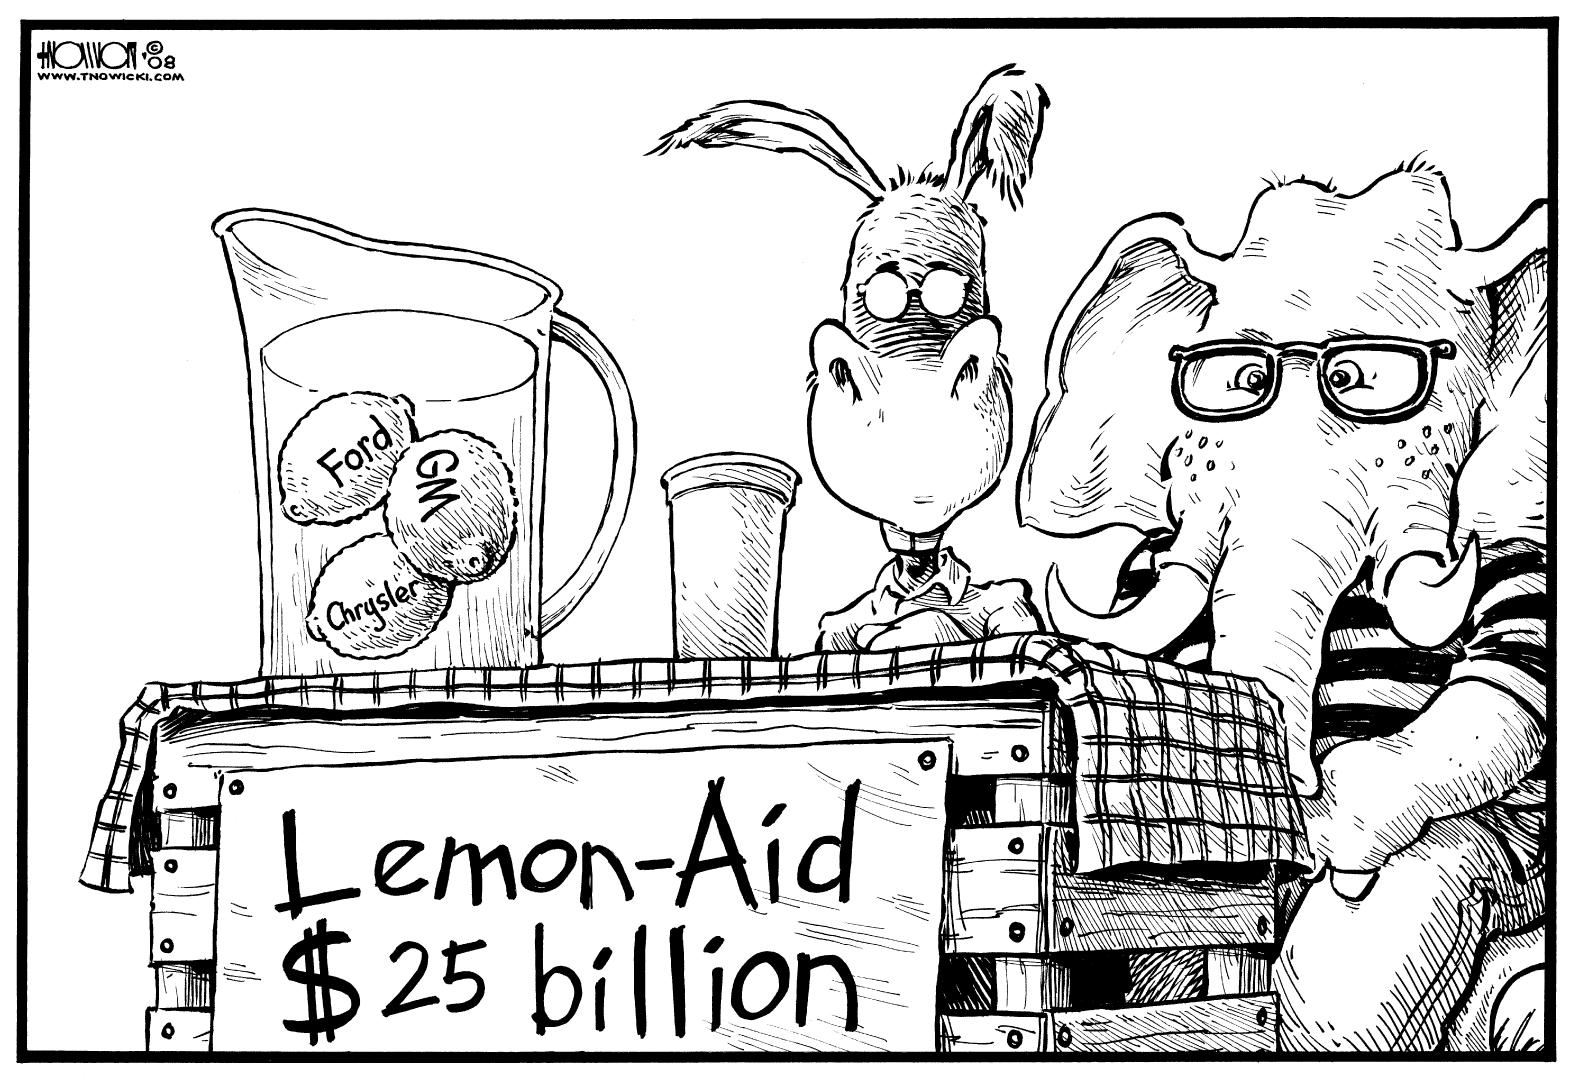 Lemon-Aid